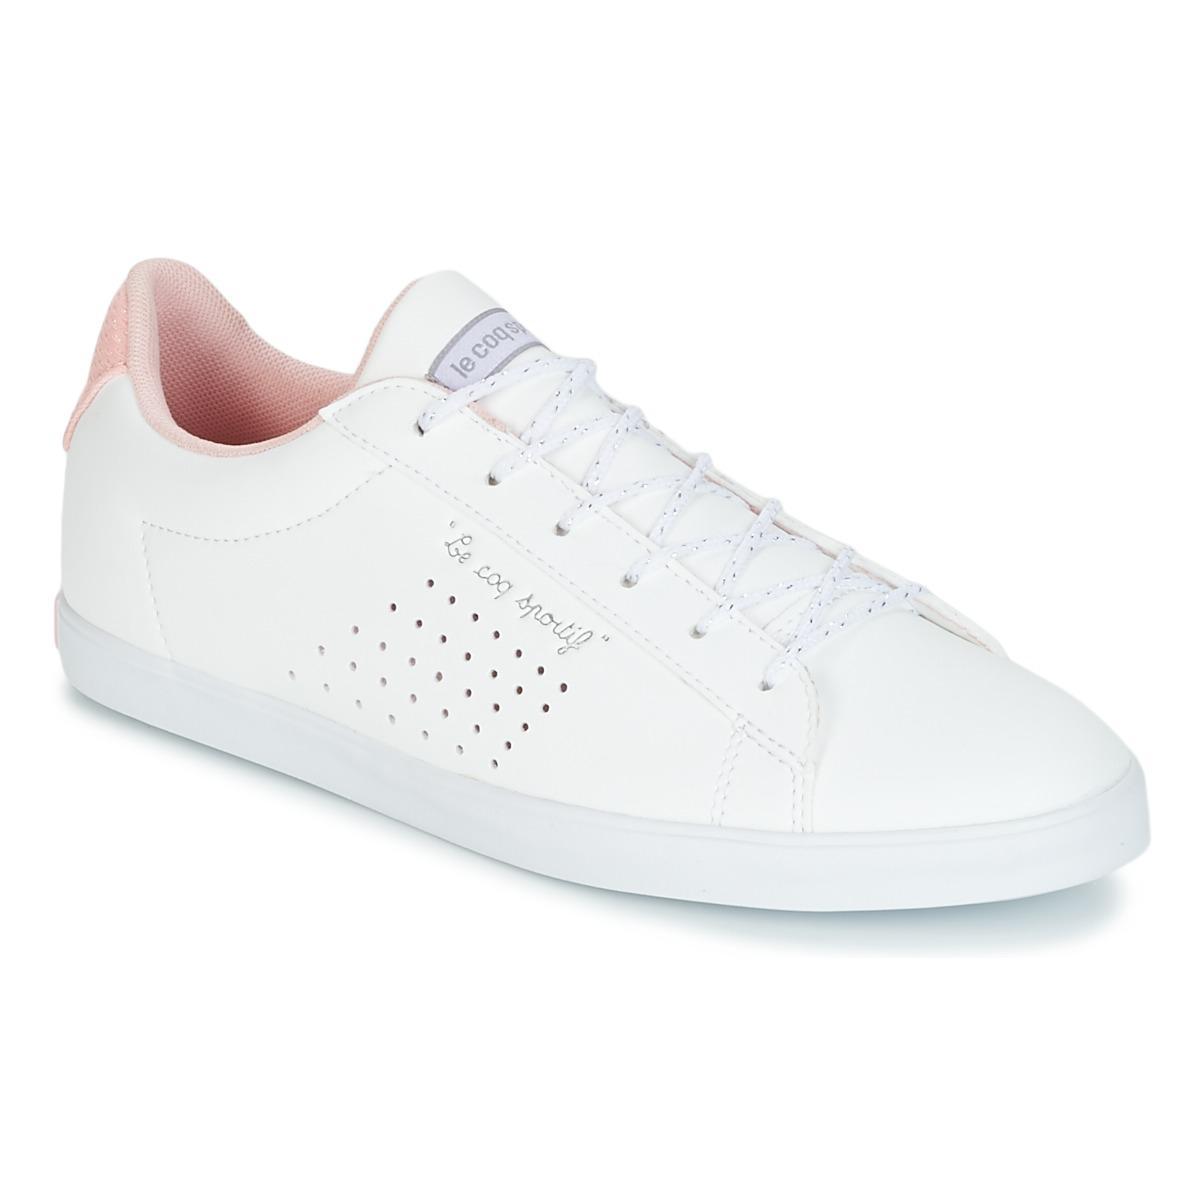 aae68f61c952 Le Coq Sportif Agate Lo S Lea metallic Mesh Women s Shoes (trainers ...